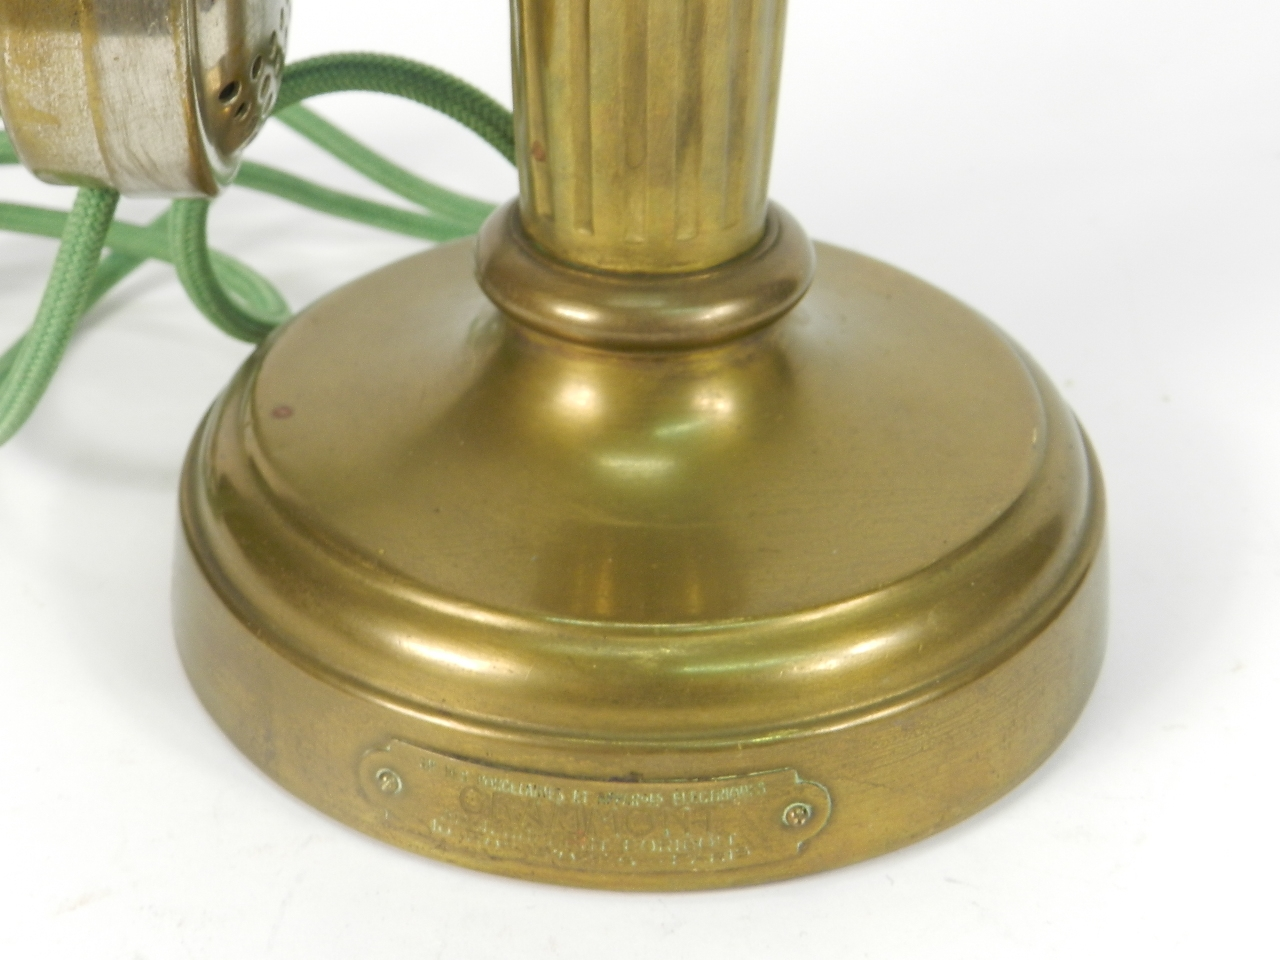 Imagen TELEFONO LATON GRAMMONT AÑO 1920 41238